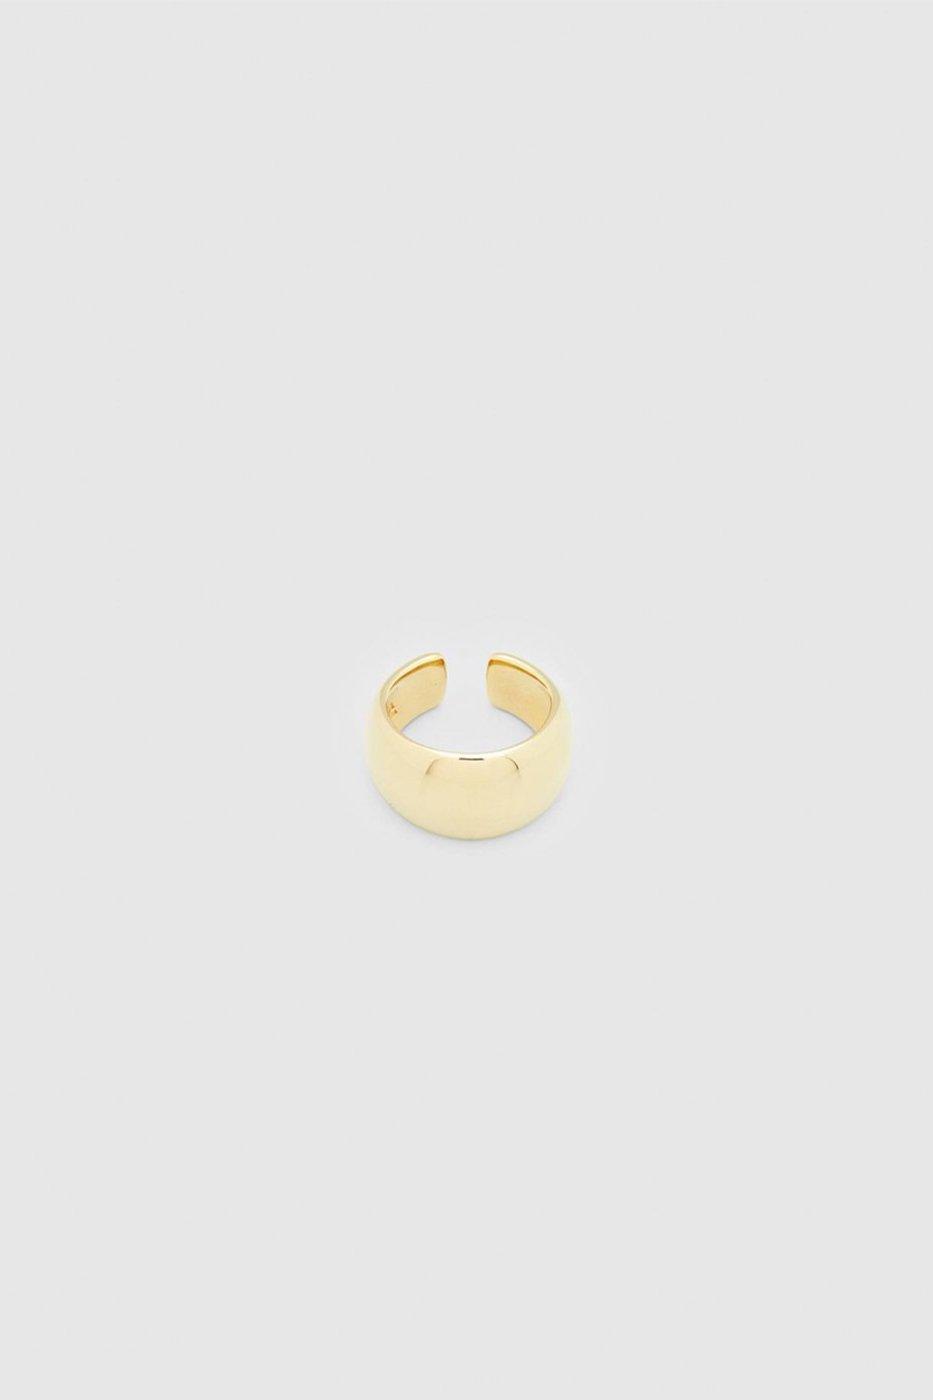 TOM WOOD トムウッド-Chubby Ear Cuff Gold-